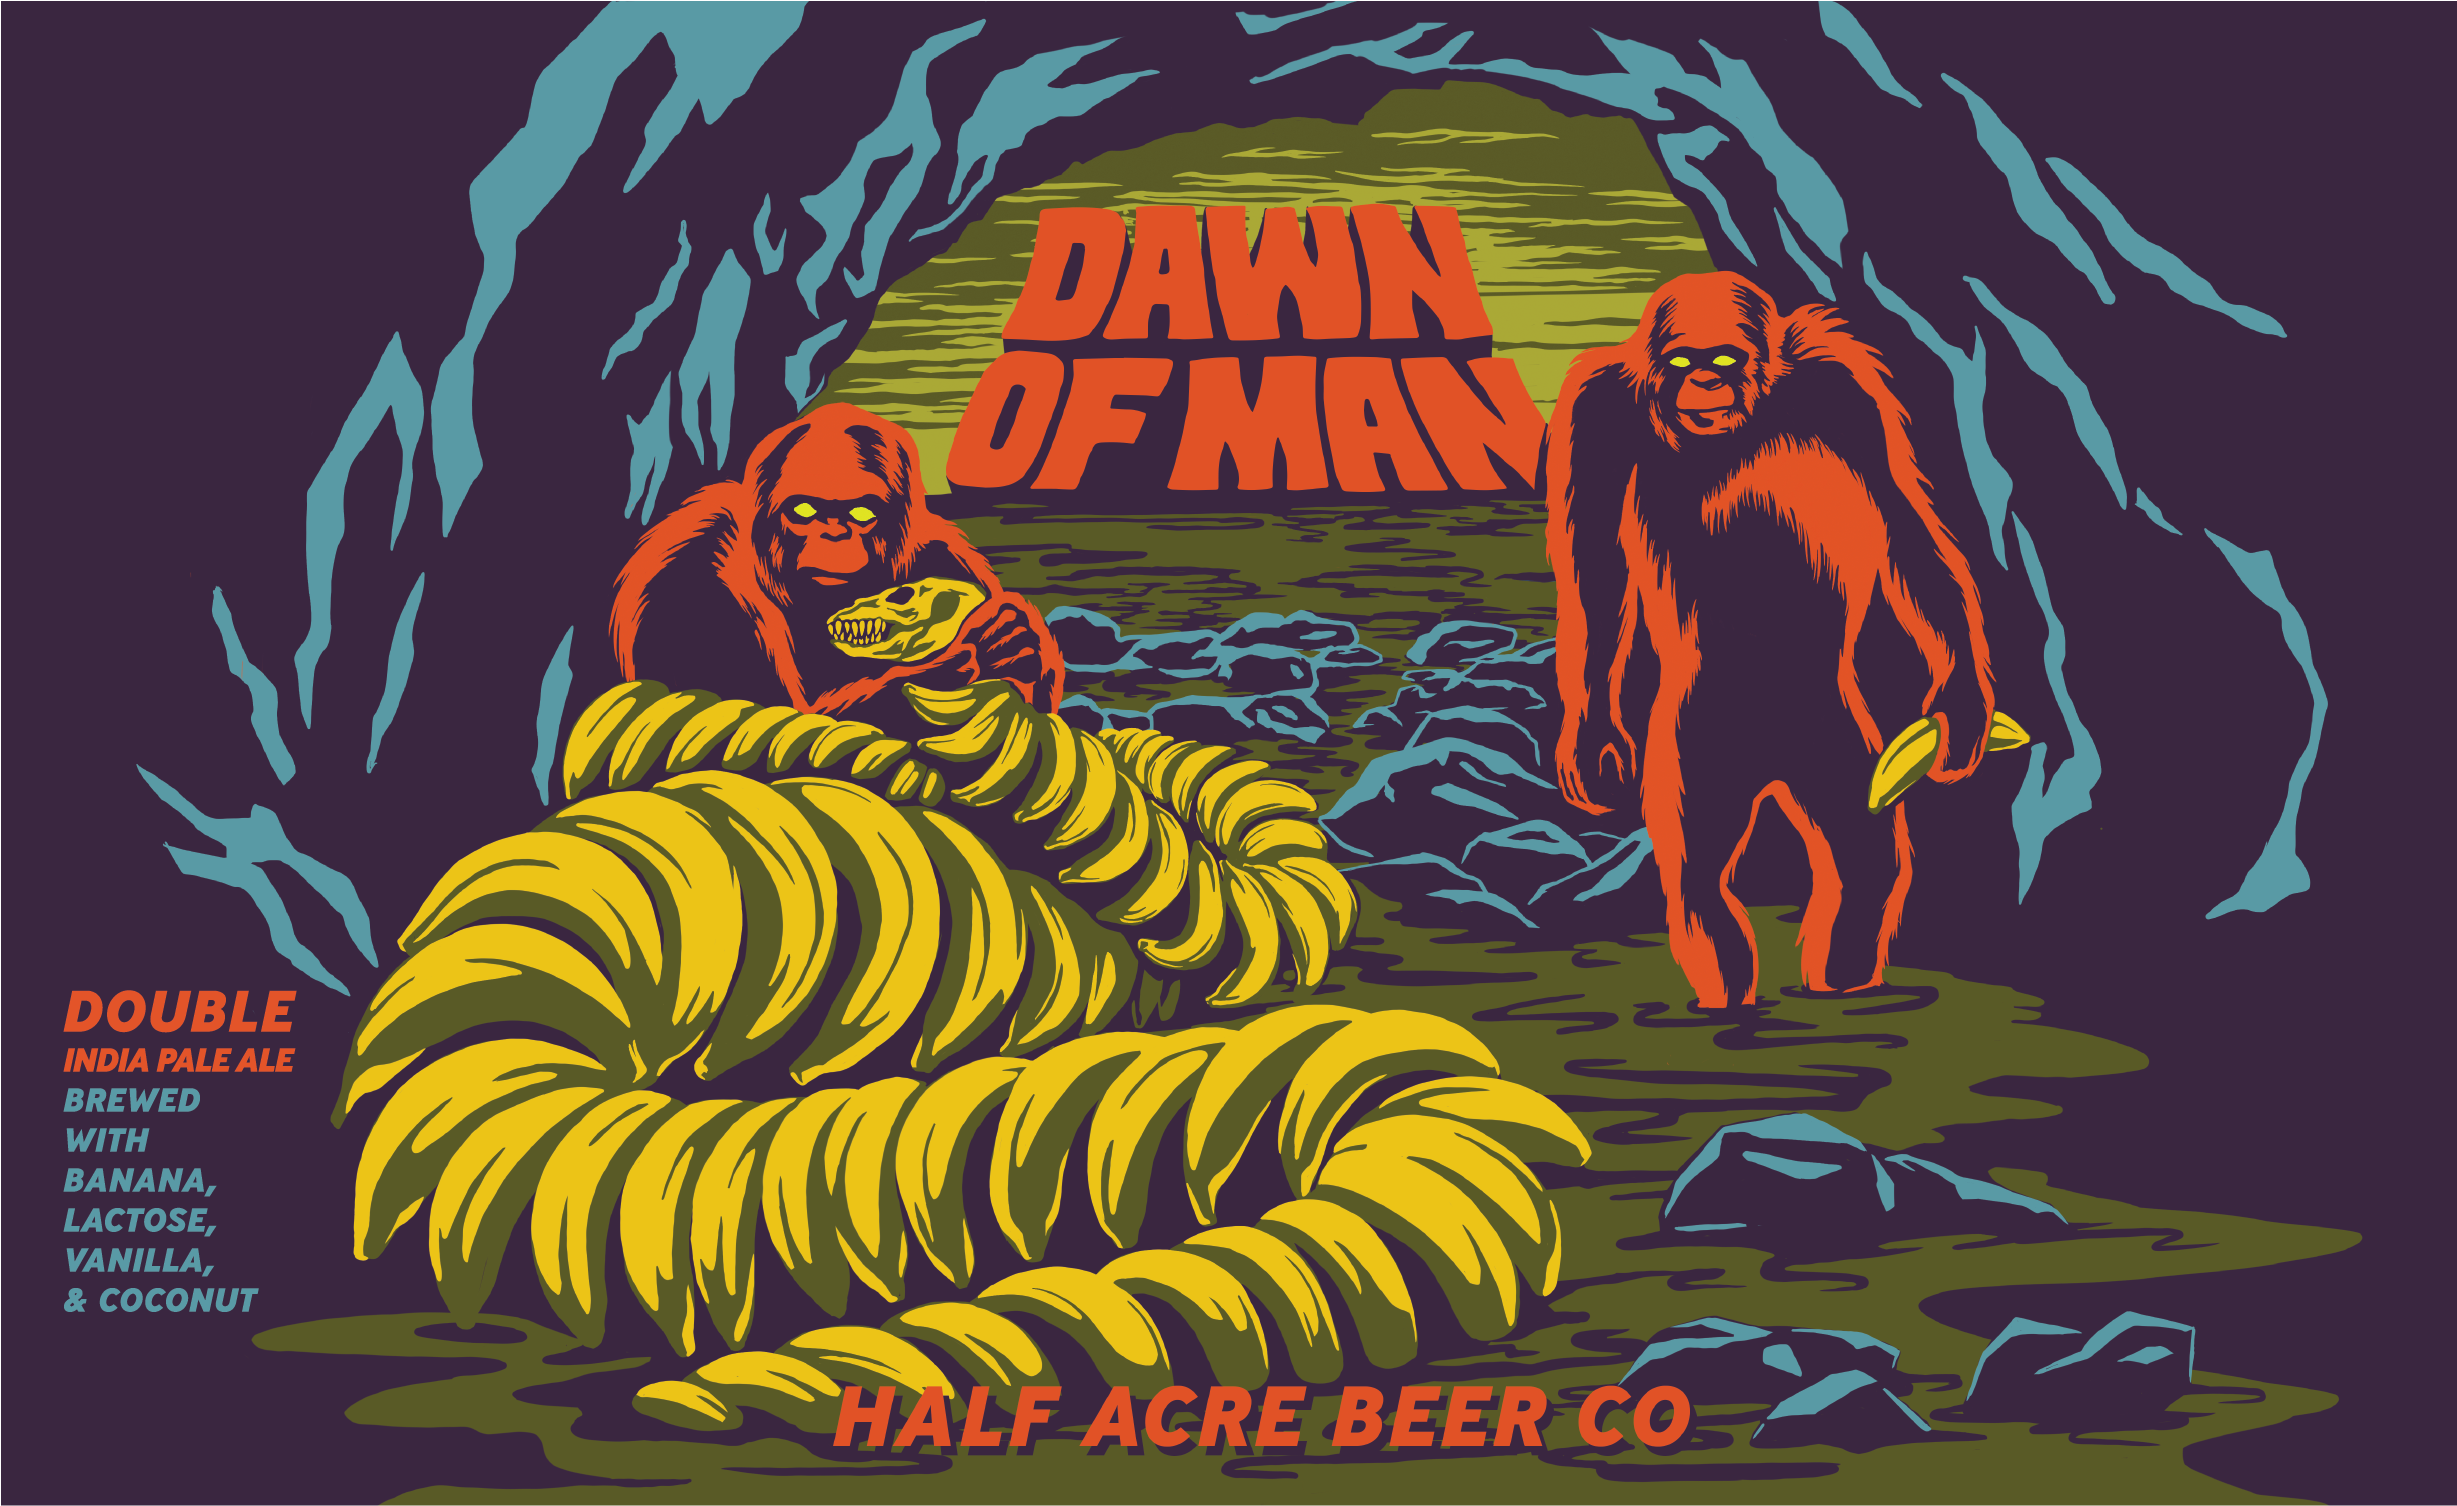 dawn-of-man-web.png